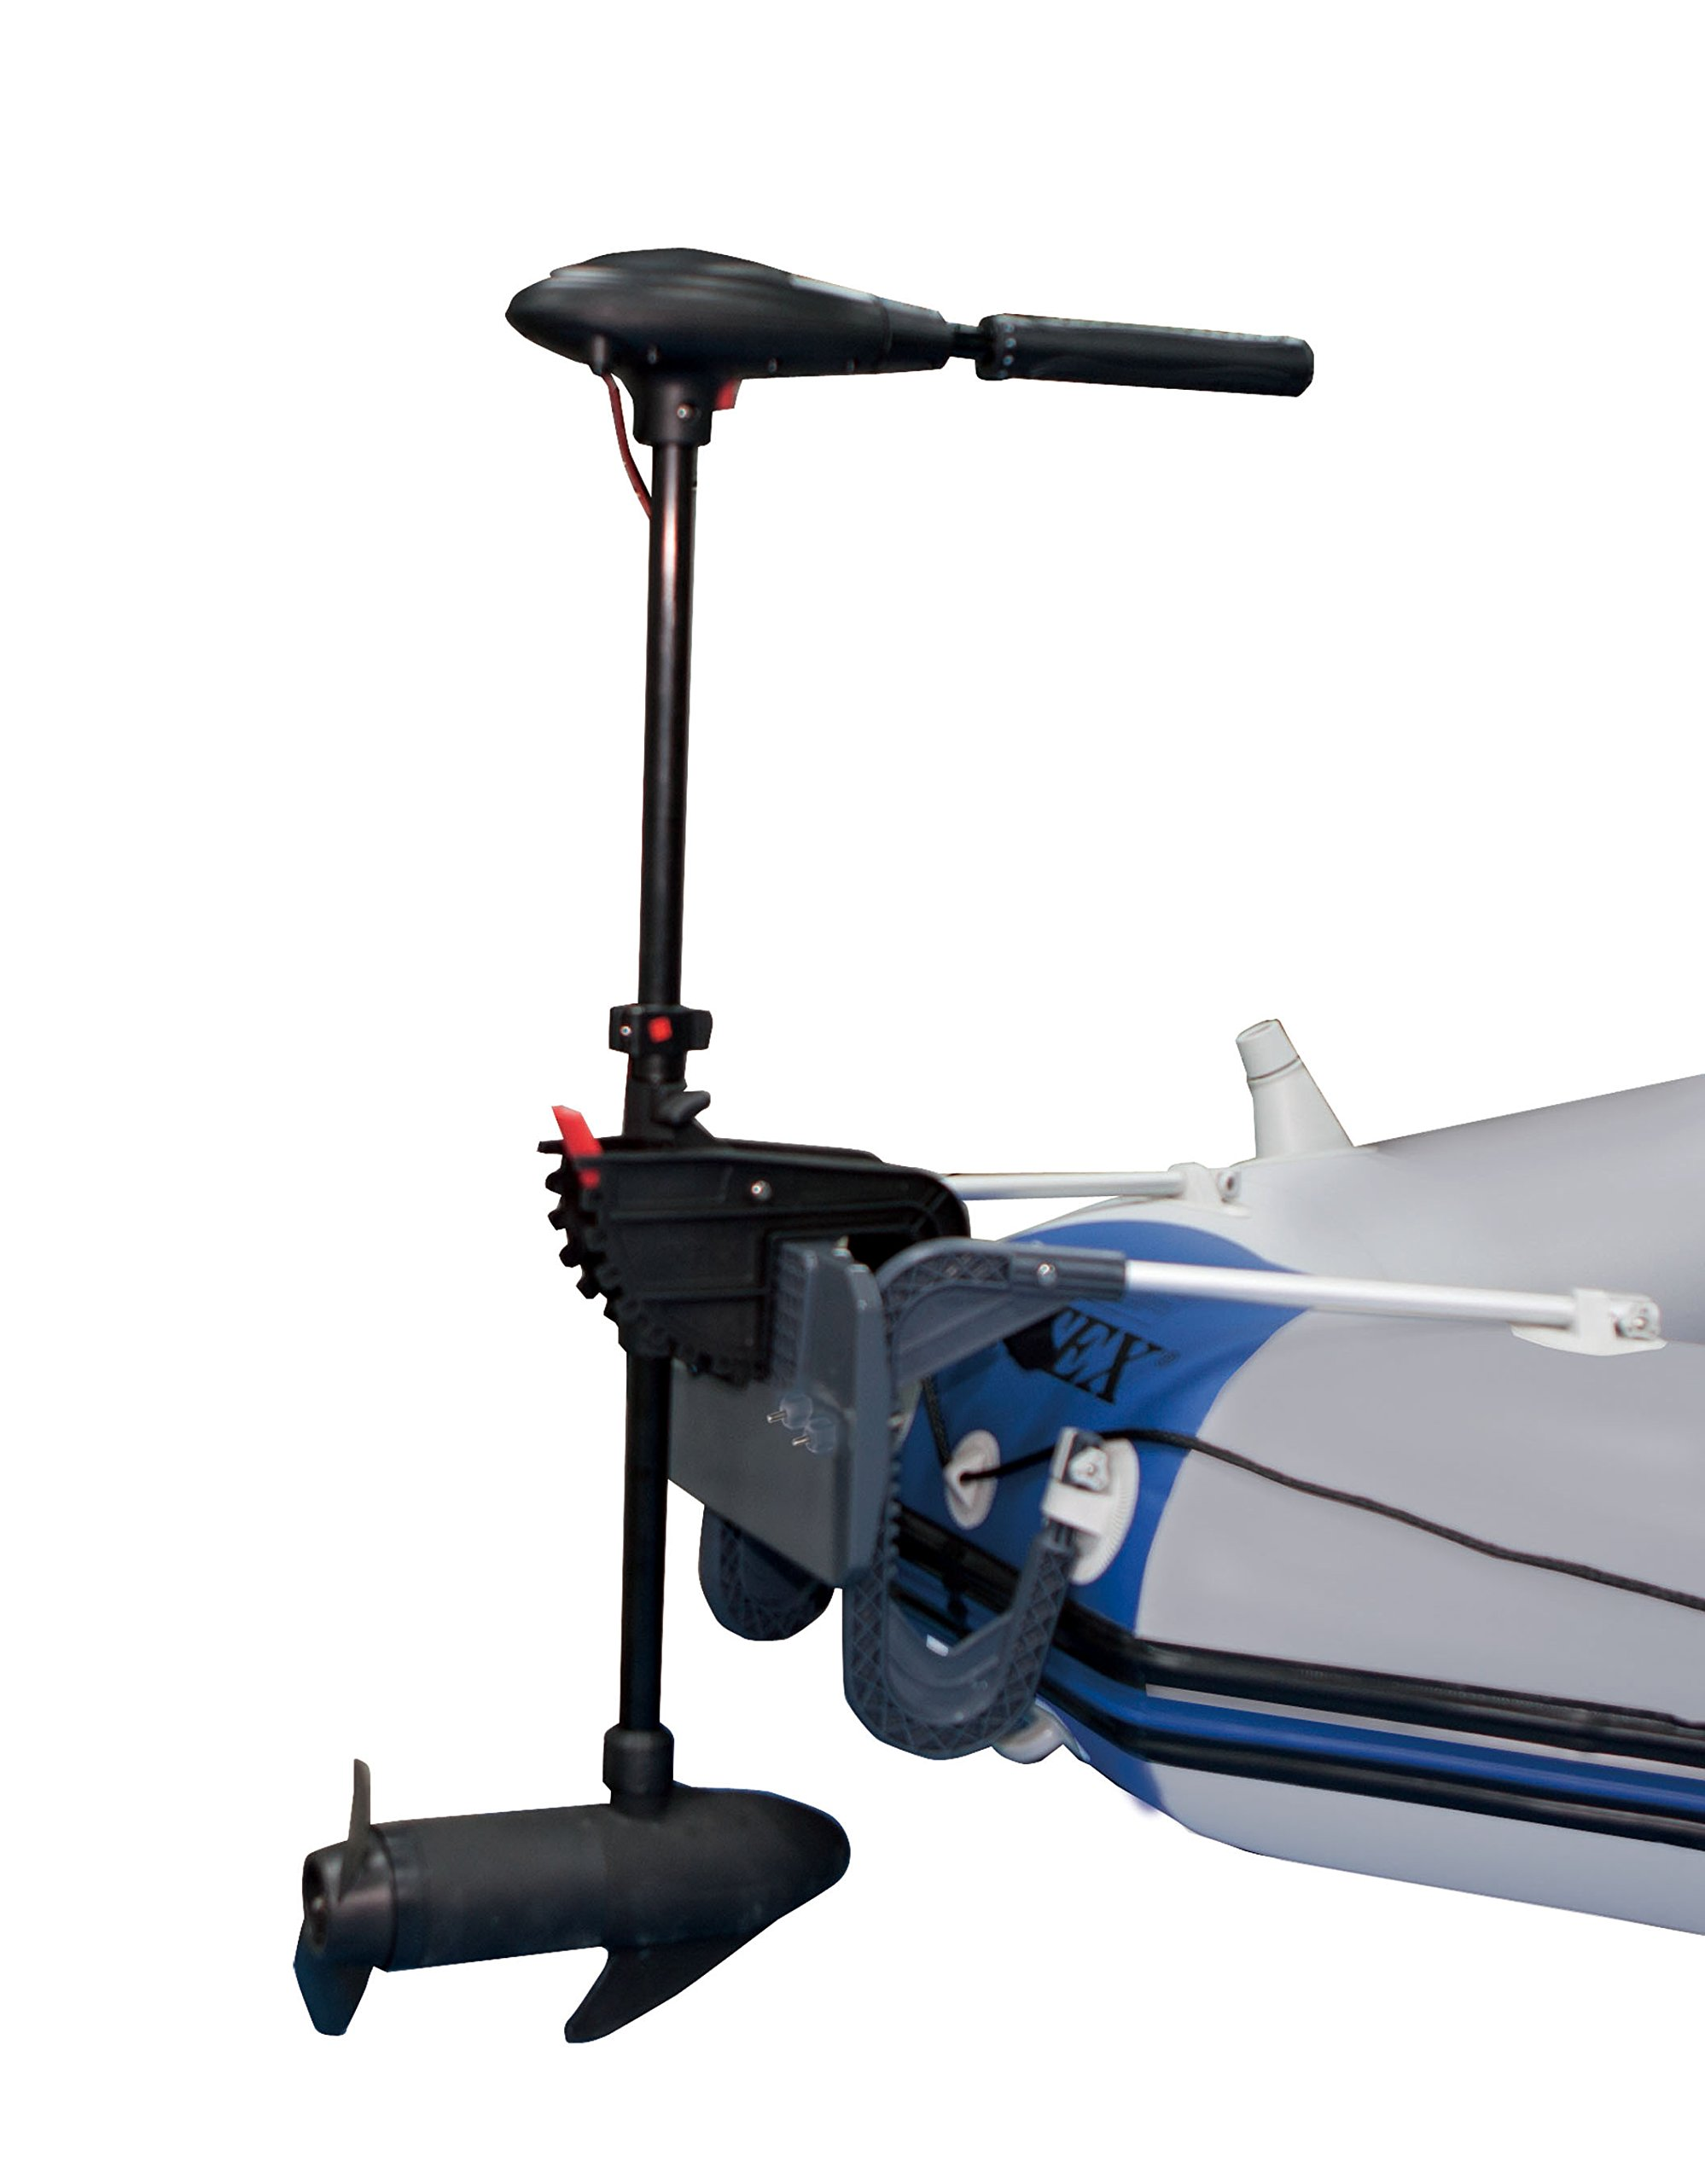 Intex Trolling Motor for Intex Inflatable Boats, 36'' Shaft